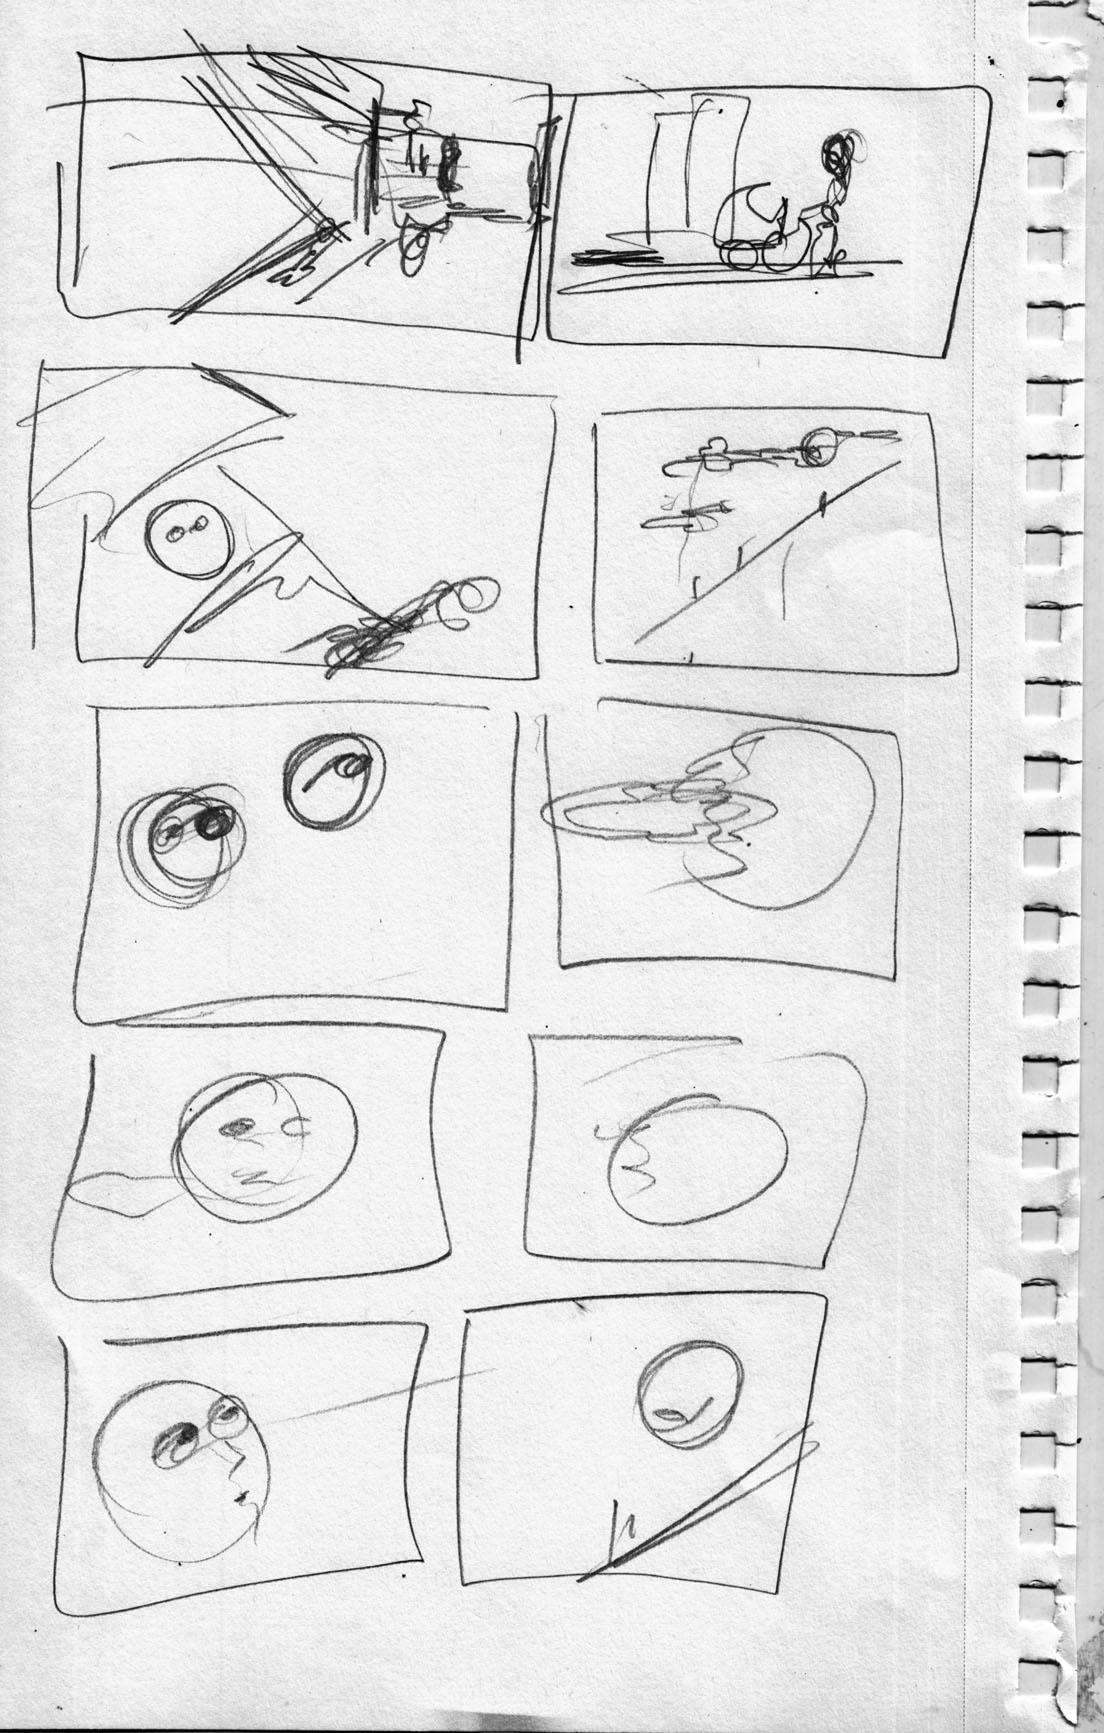 8-29 thumbnails ch 1